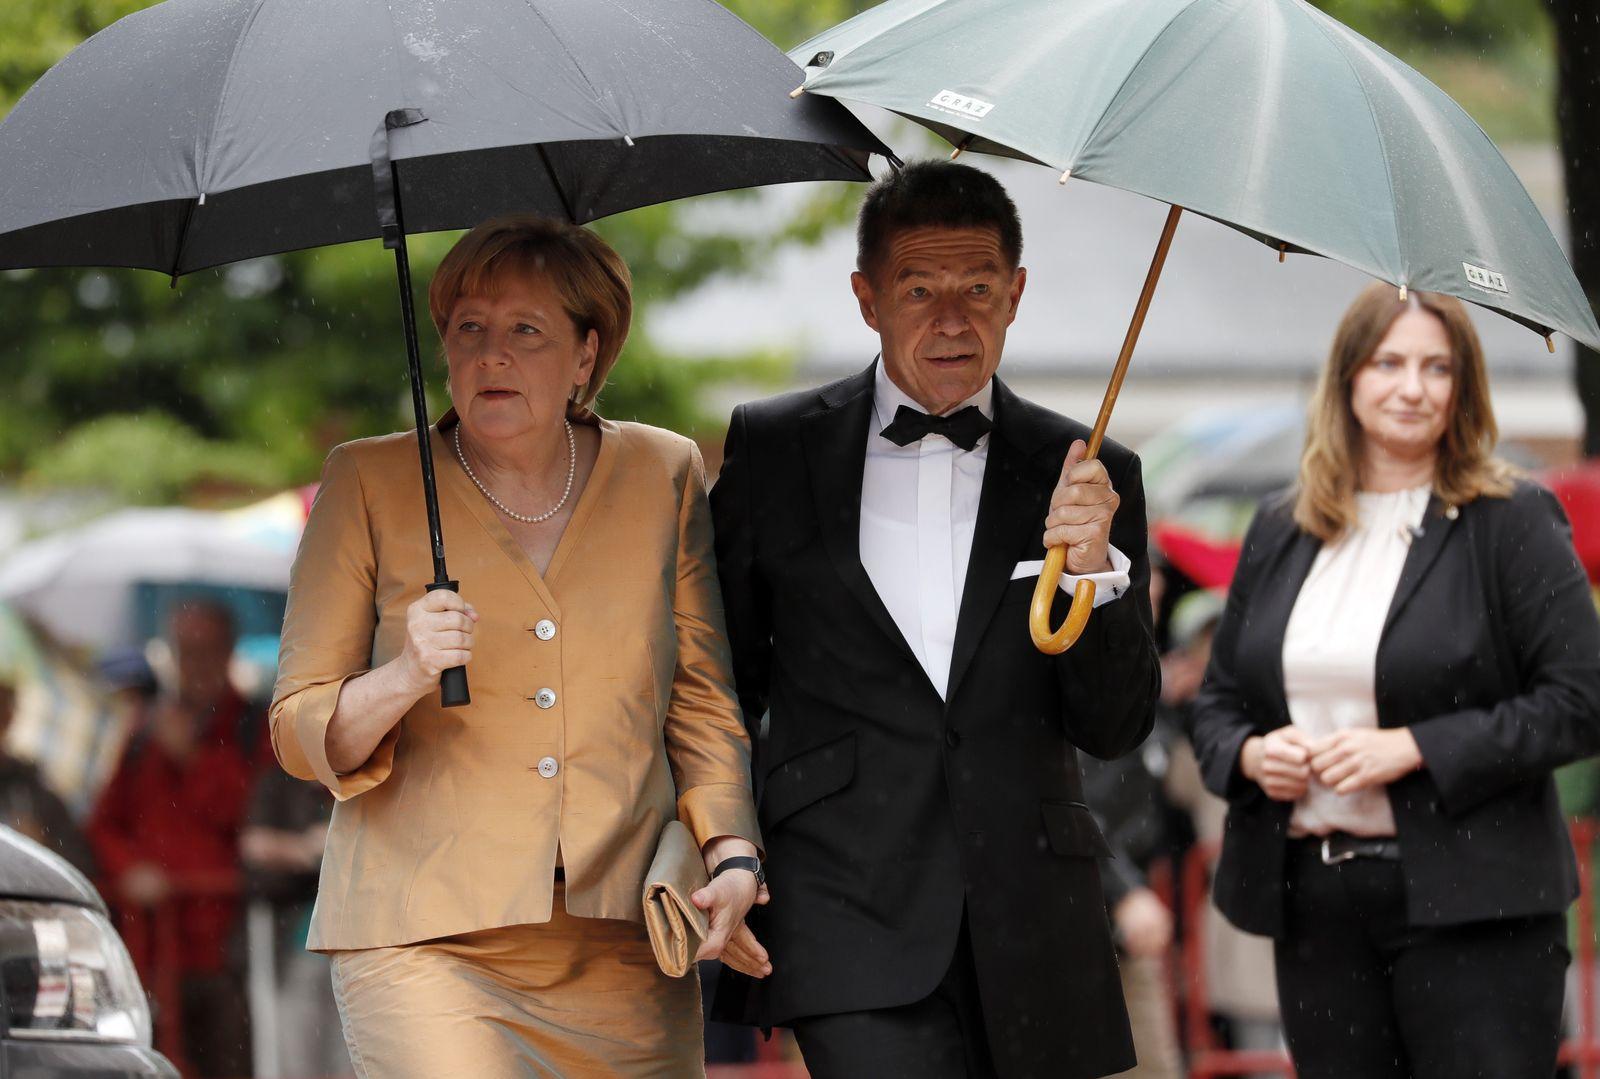 Bayreuther Festspiele 2017 / Angela Merkel